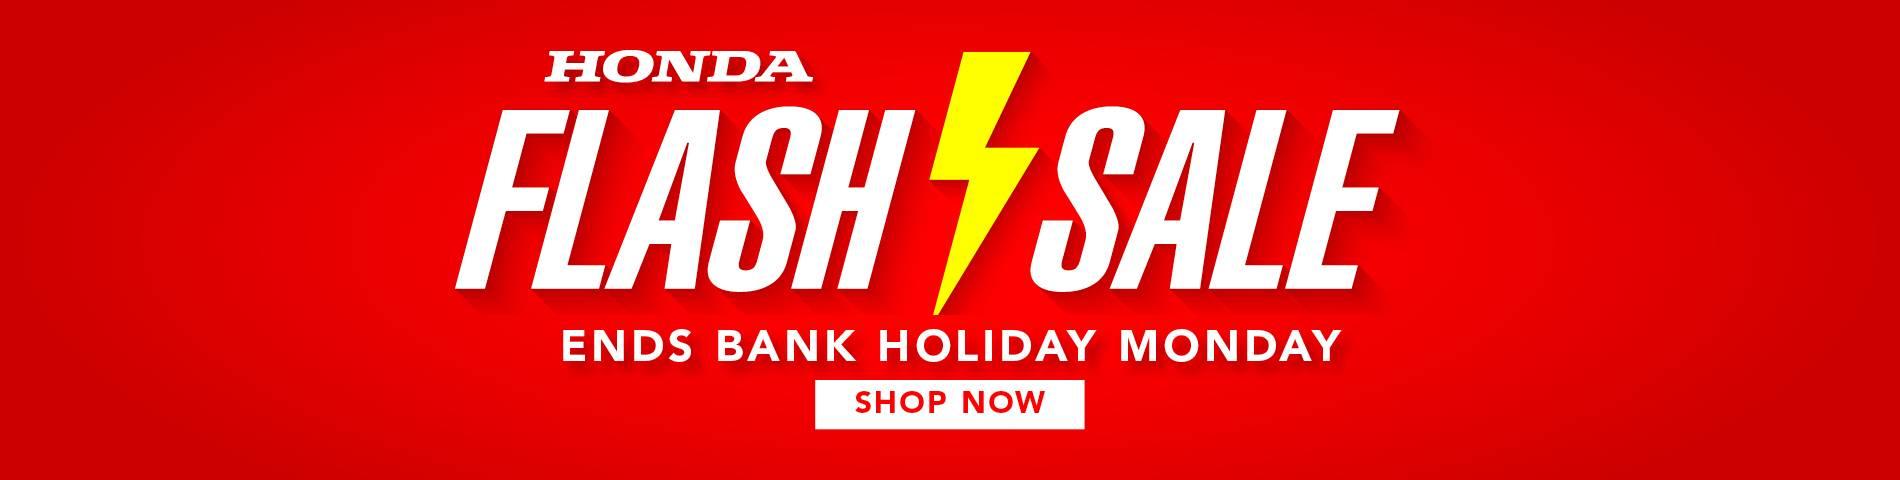 Honda Flash Sale